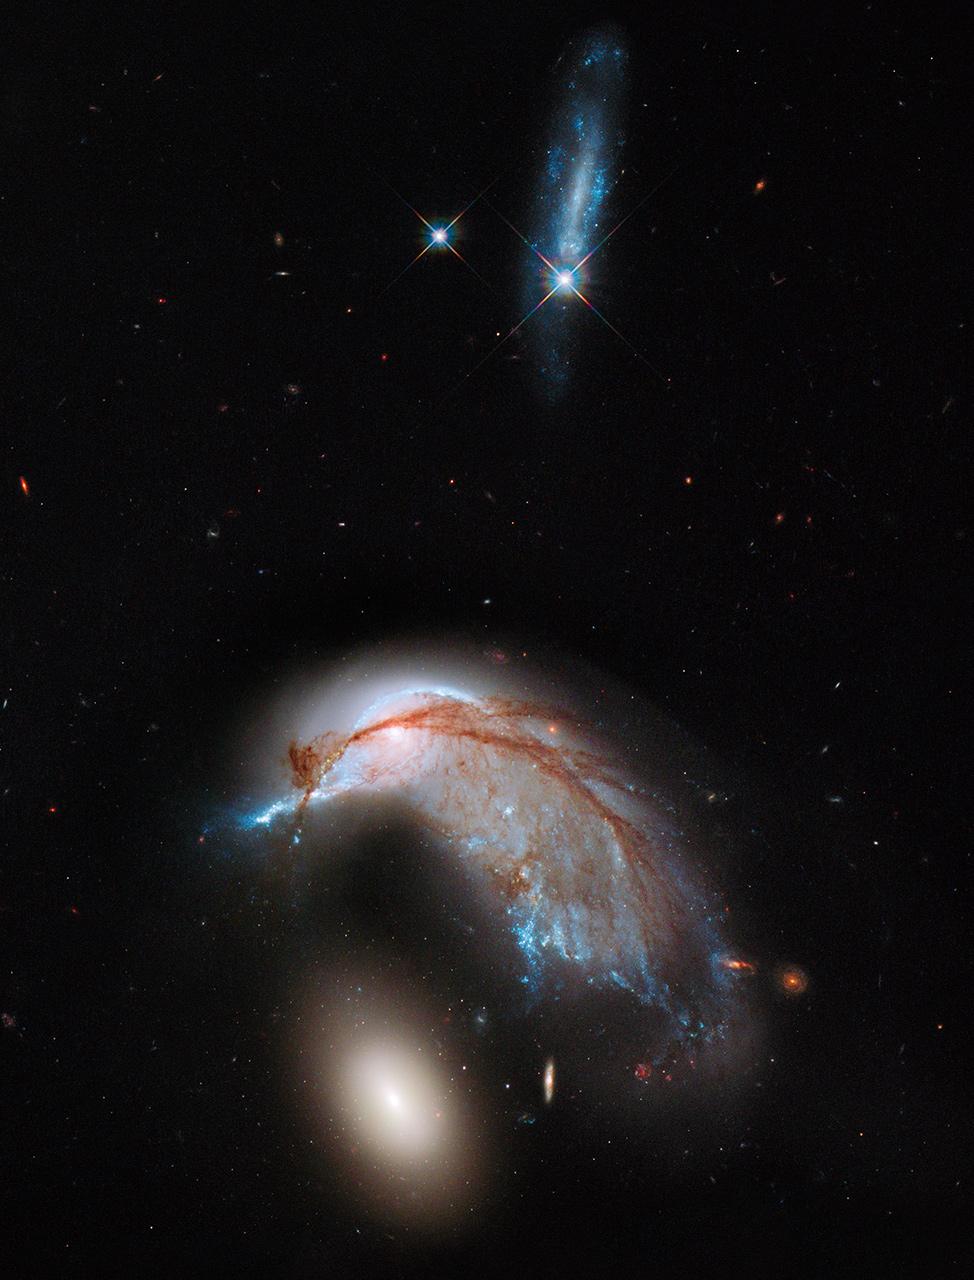 hubble telescope galaxies colliding - photo #9